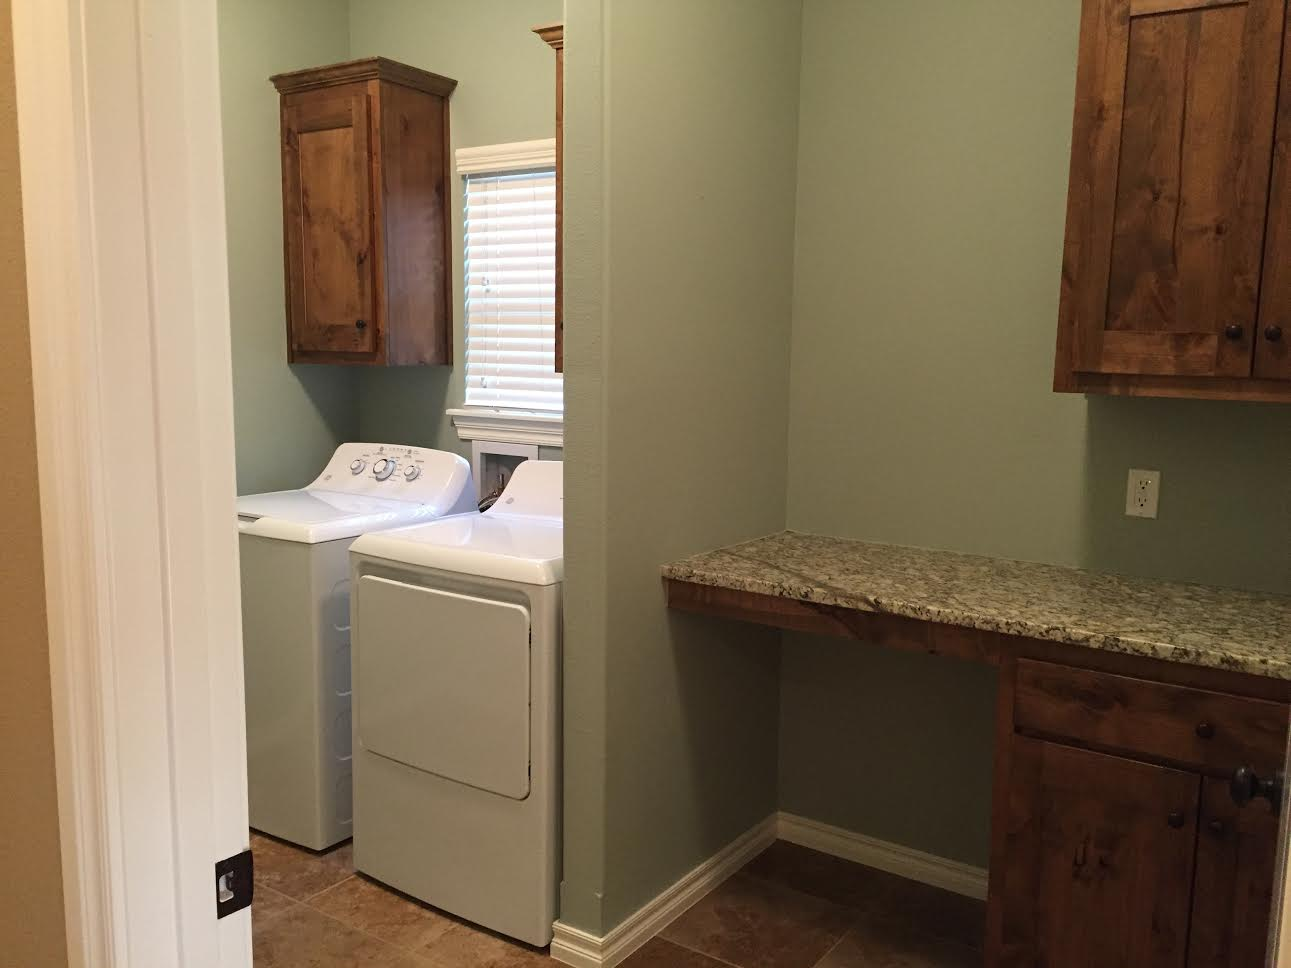 Bedford 3408 laundry.jpg